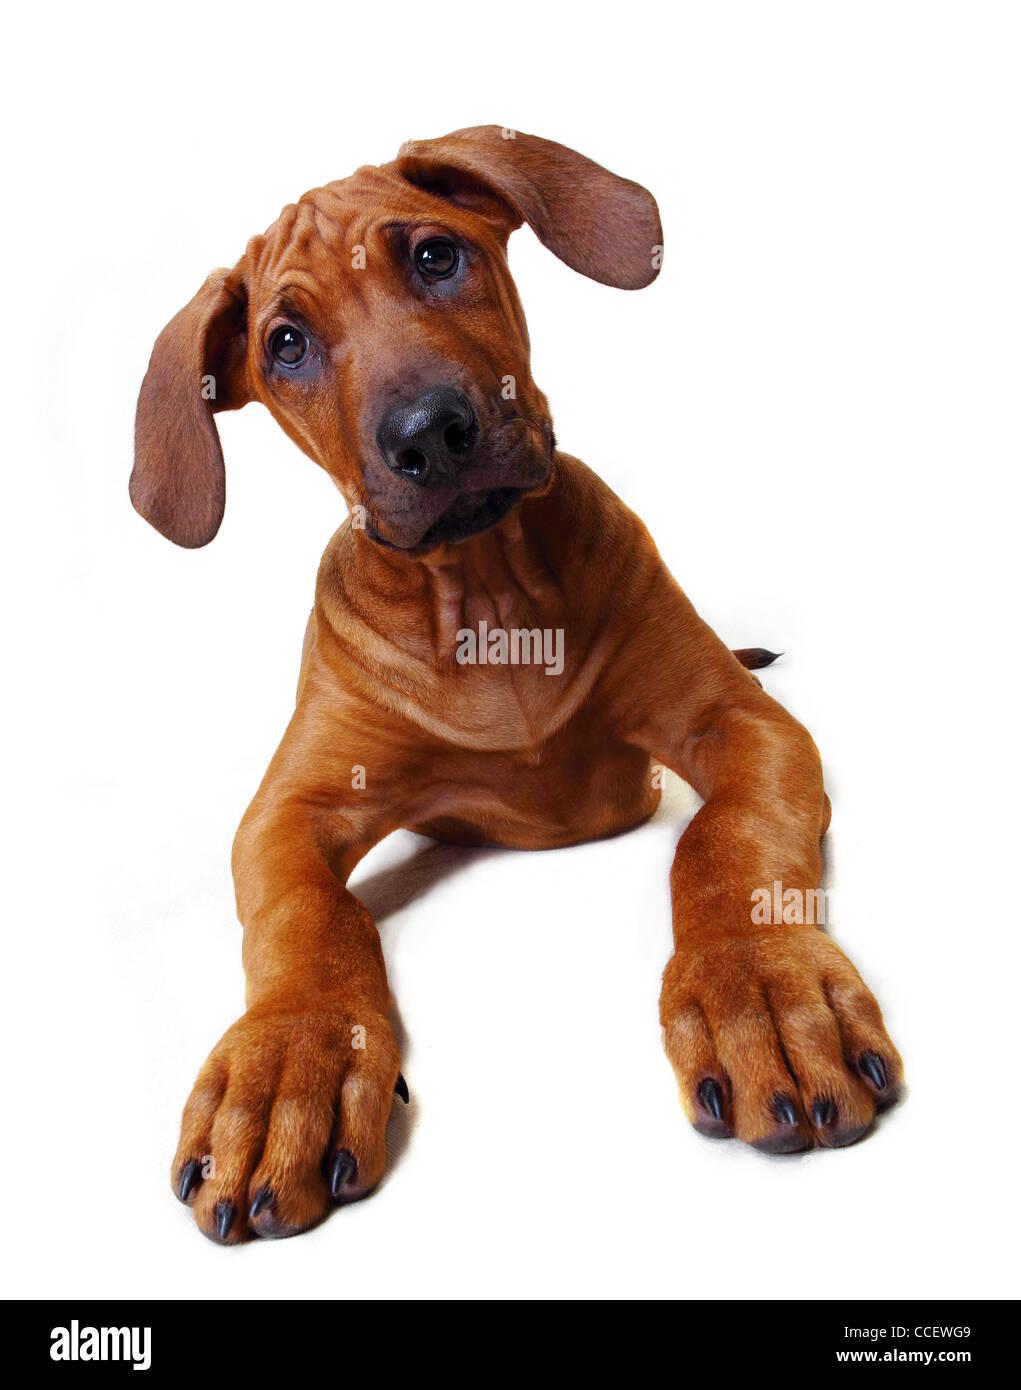 A Rhodesian Ridgeback puppy sitting down Stock Photo